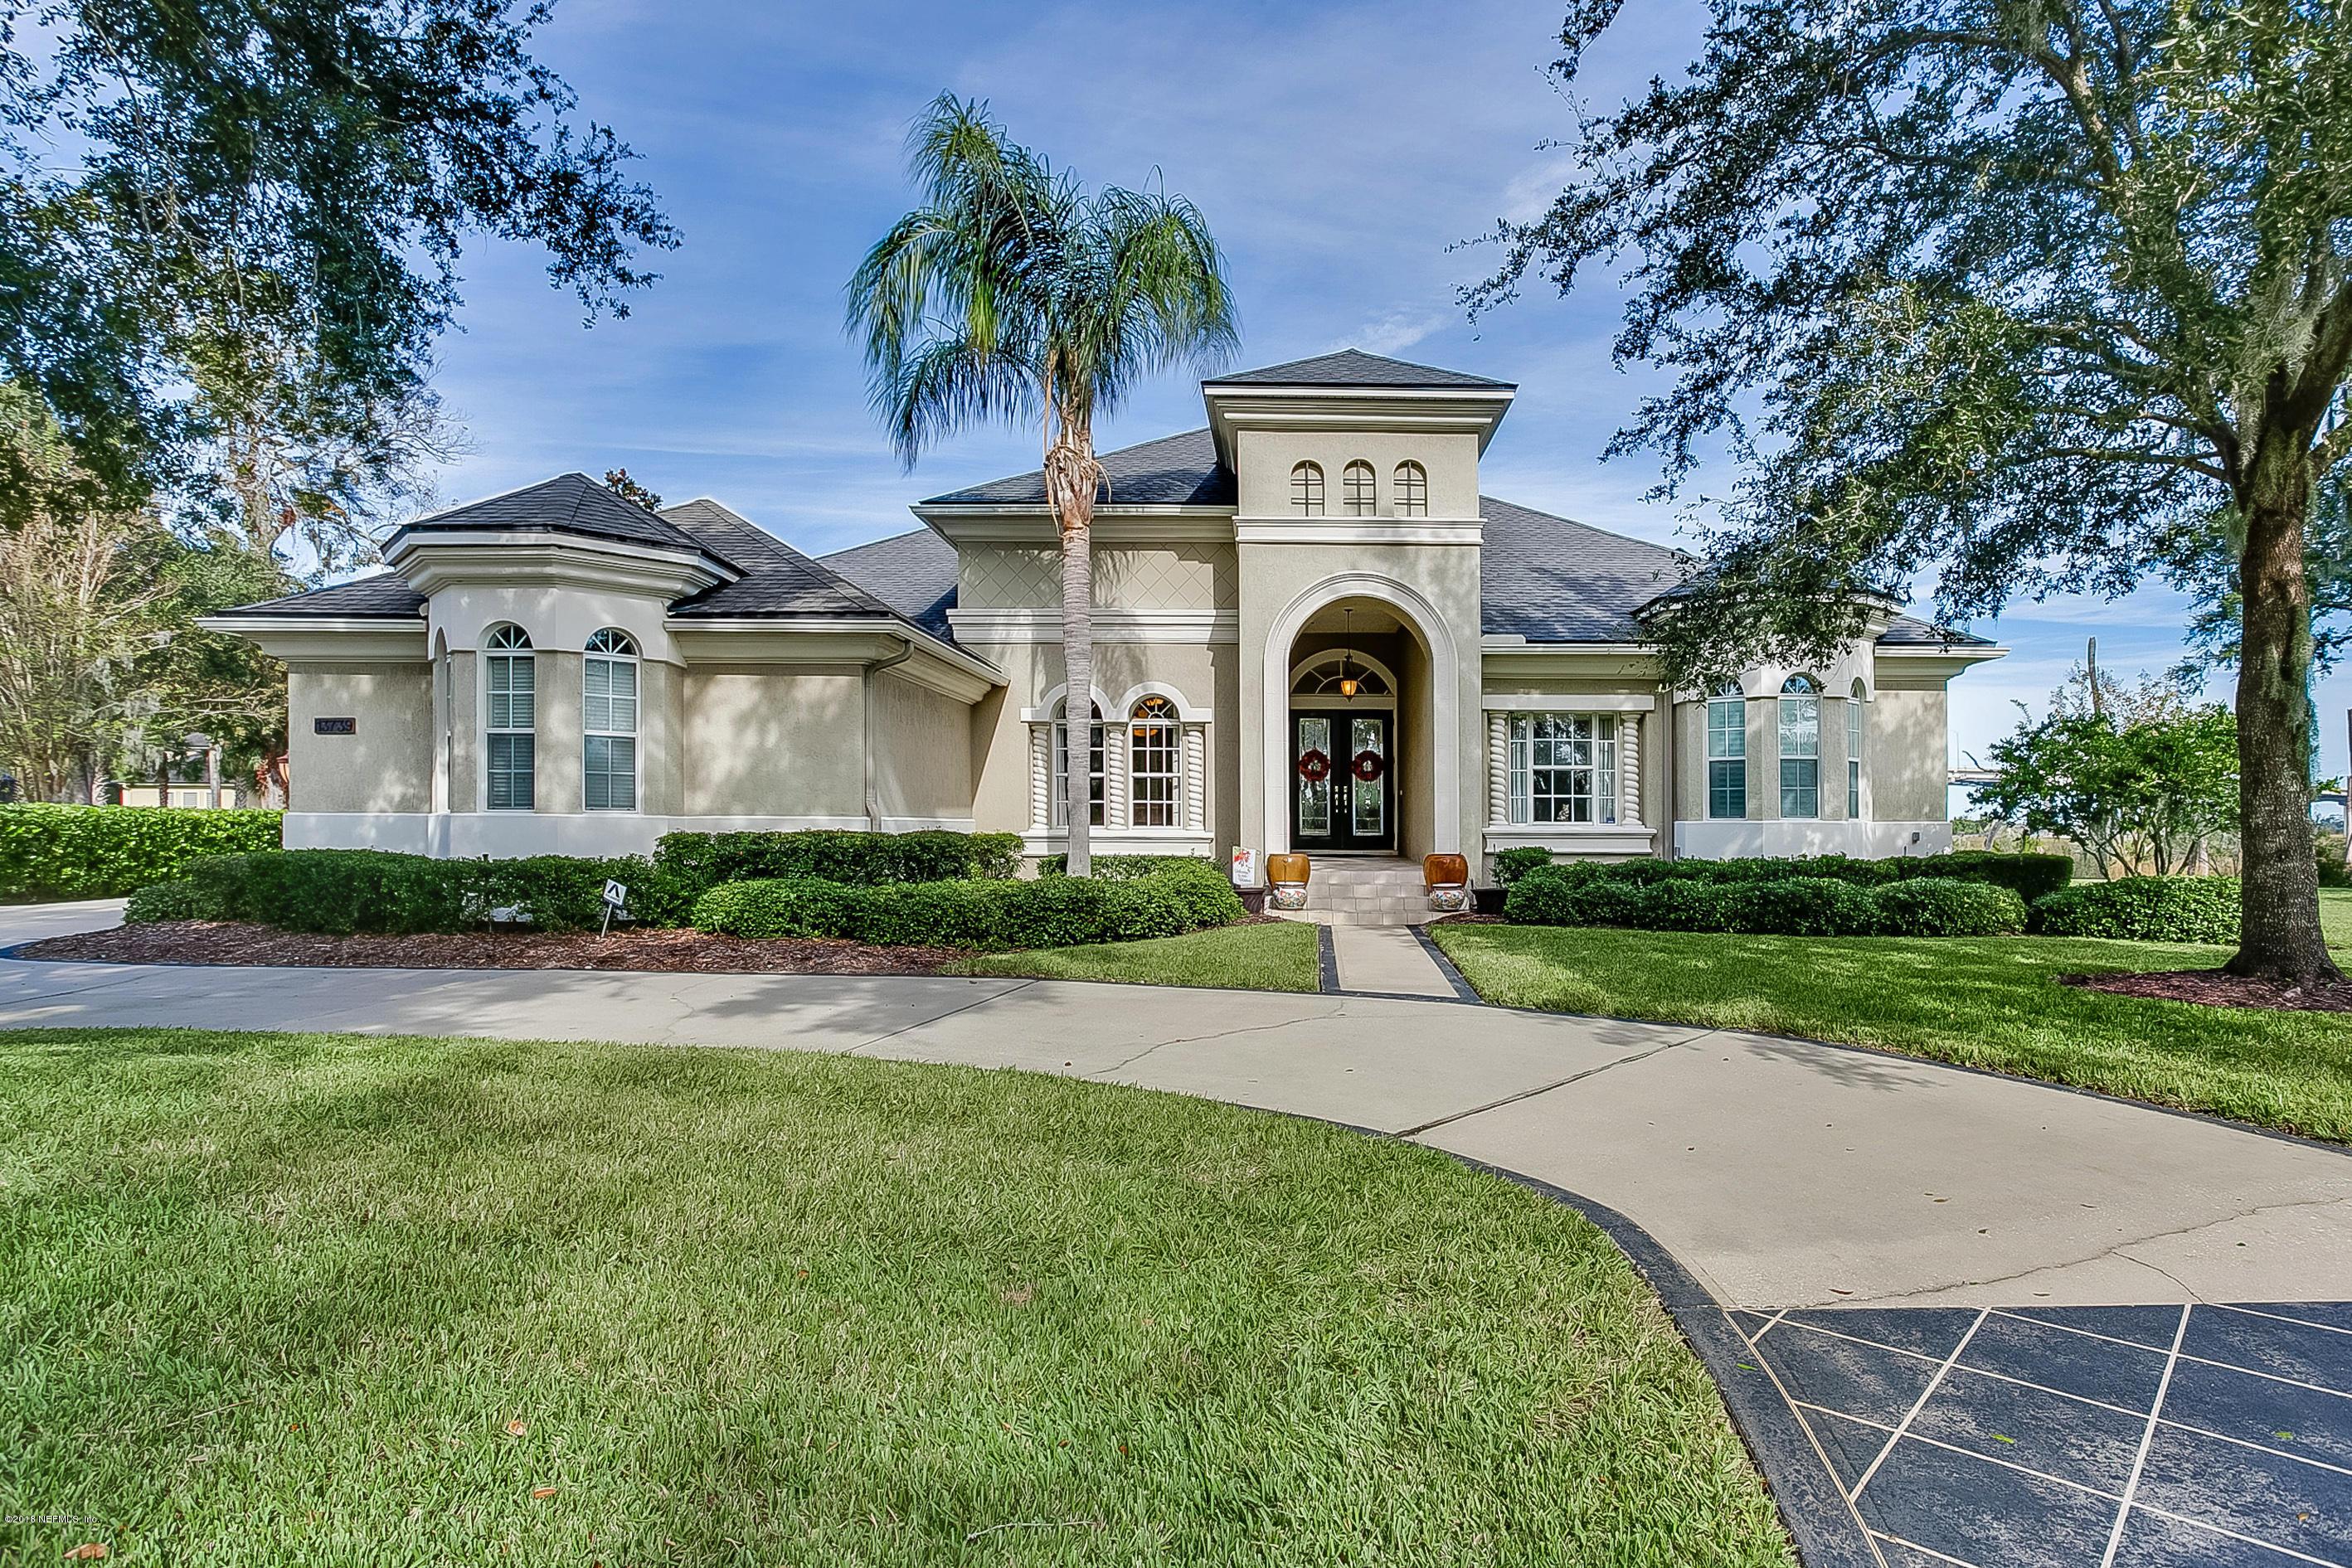 13739 MARSH HARBOR, JACKSONVILLE, FLORIDA 32225, 4 Bedrooms Bedrooms, ,4 BathroomsBathrooms,Residential - single family,For sale,MARSH HARBOR,969949